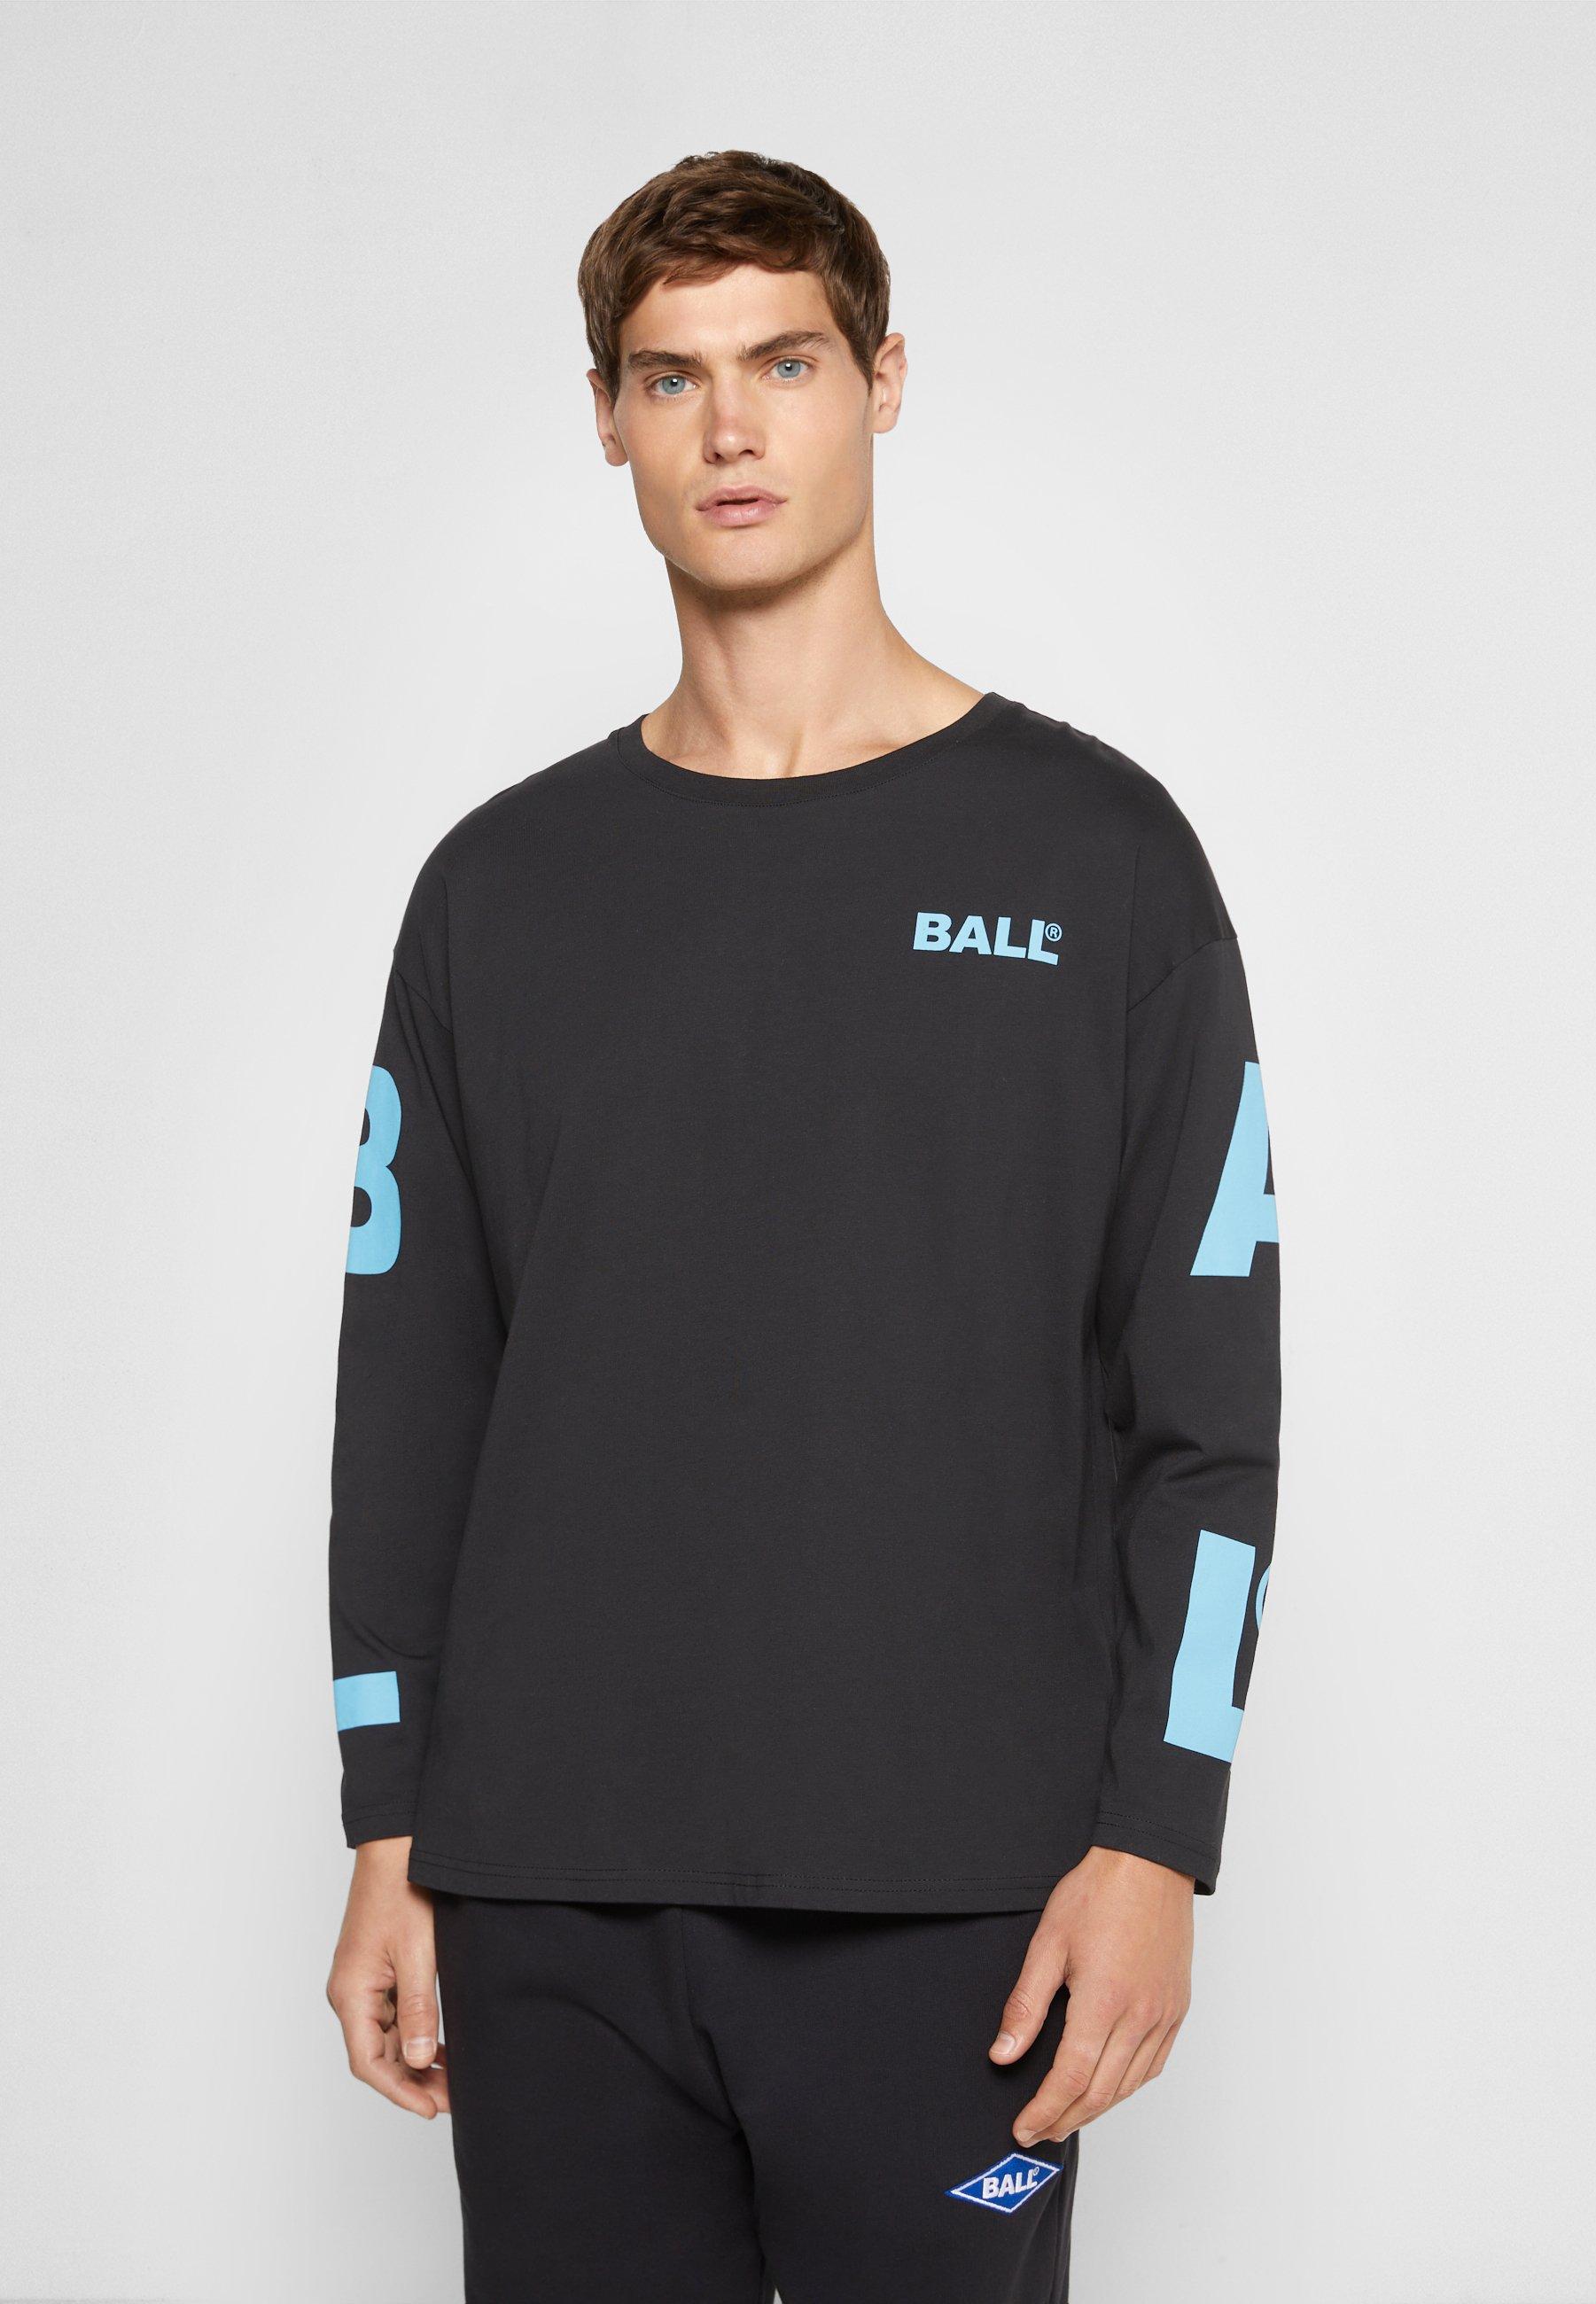 Homme BALL LS - T-shirt à manches longues